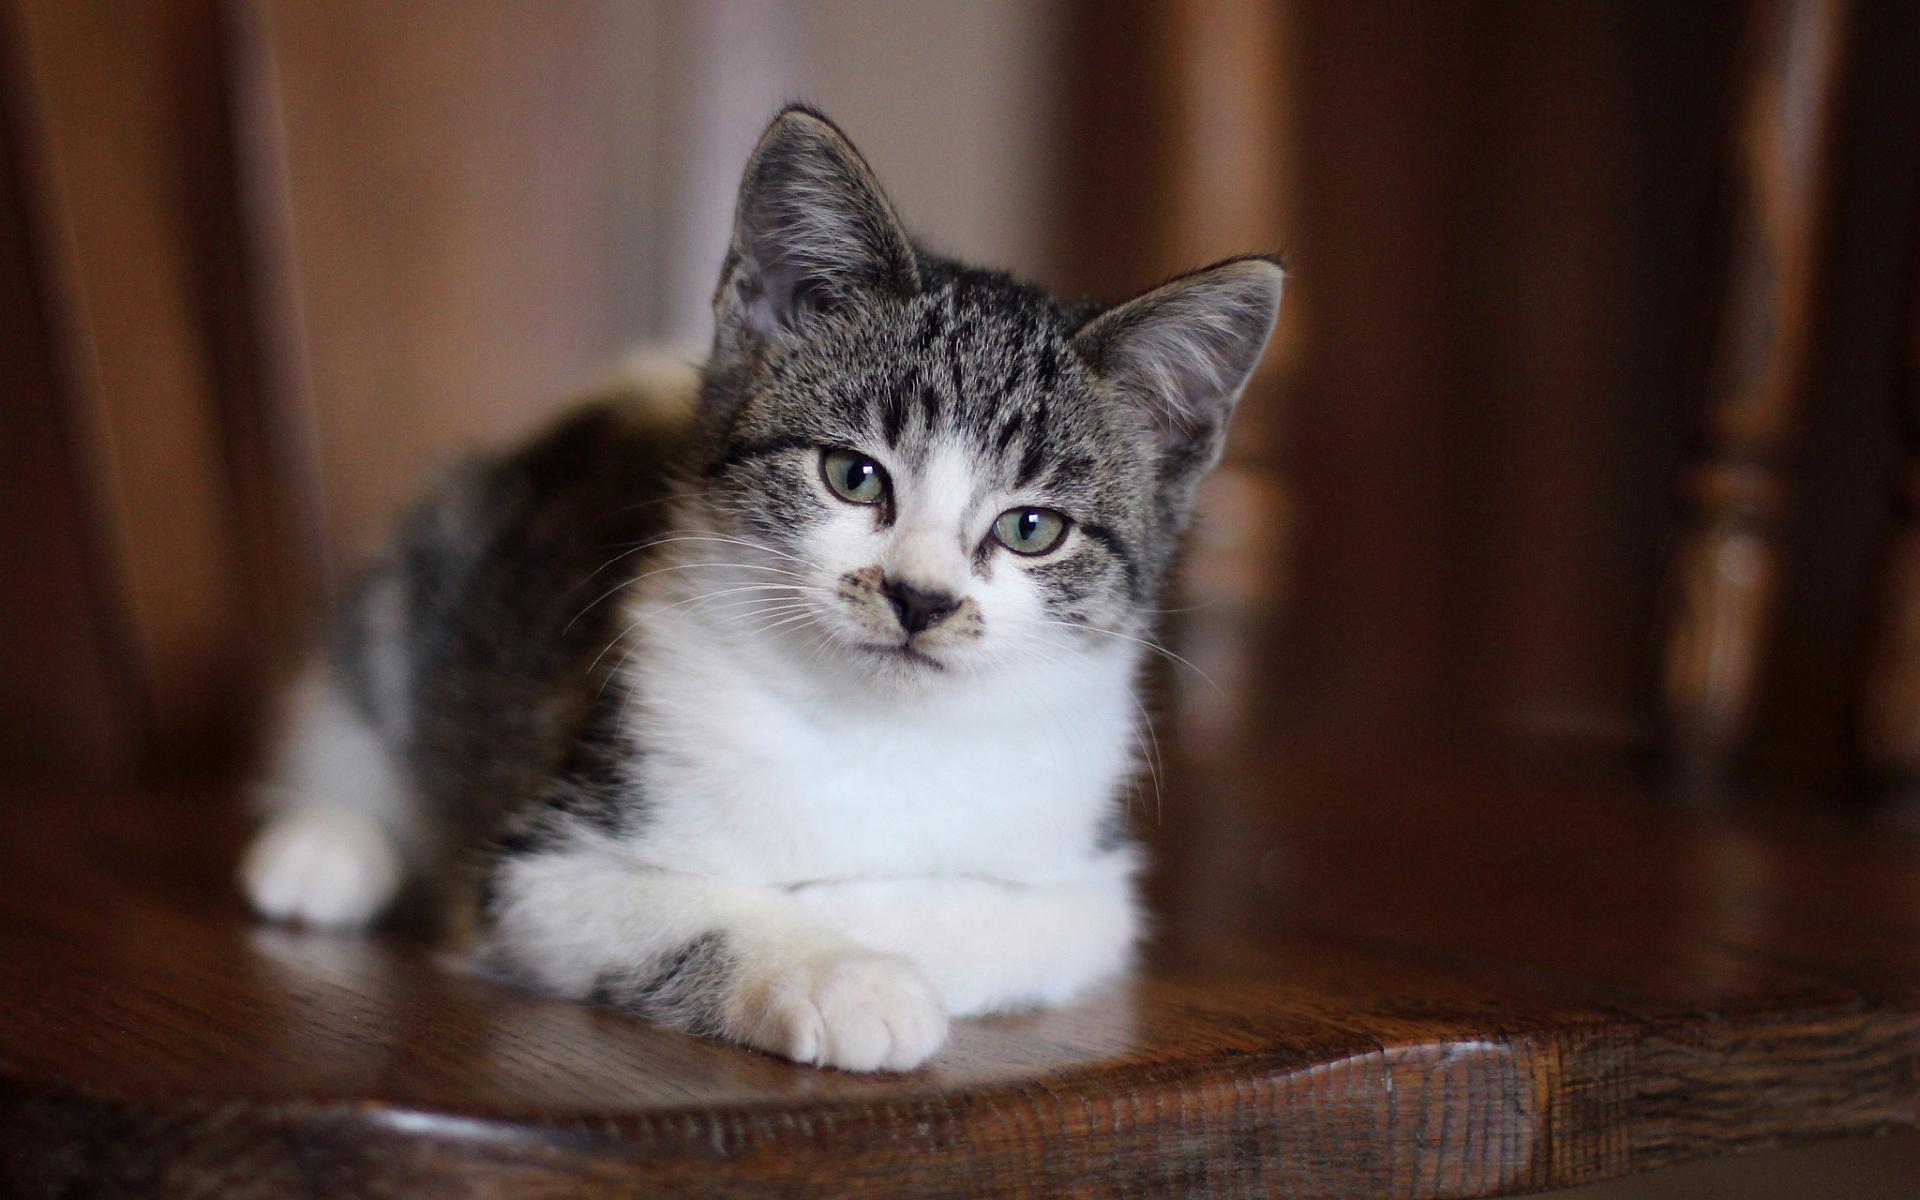 Download Cute Baby Wallpapers Free Cat Cute Basket Hd Desktop Wallpapers 4k Hd